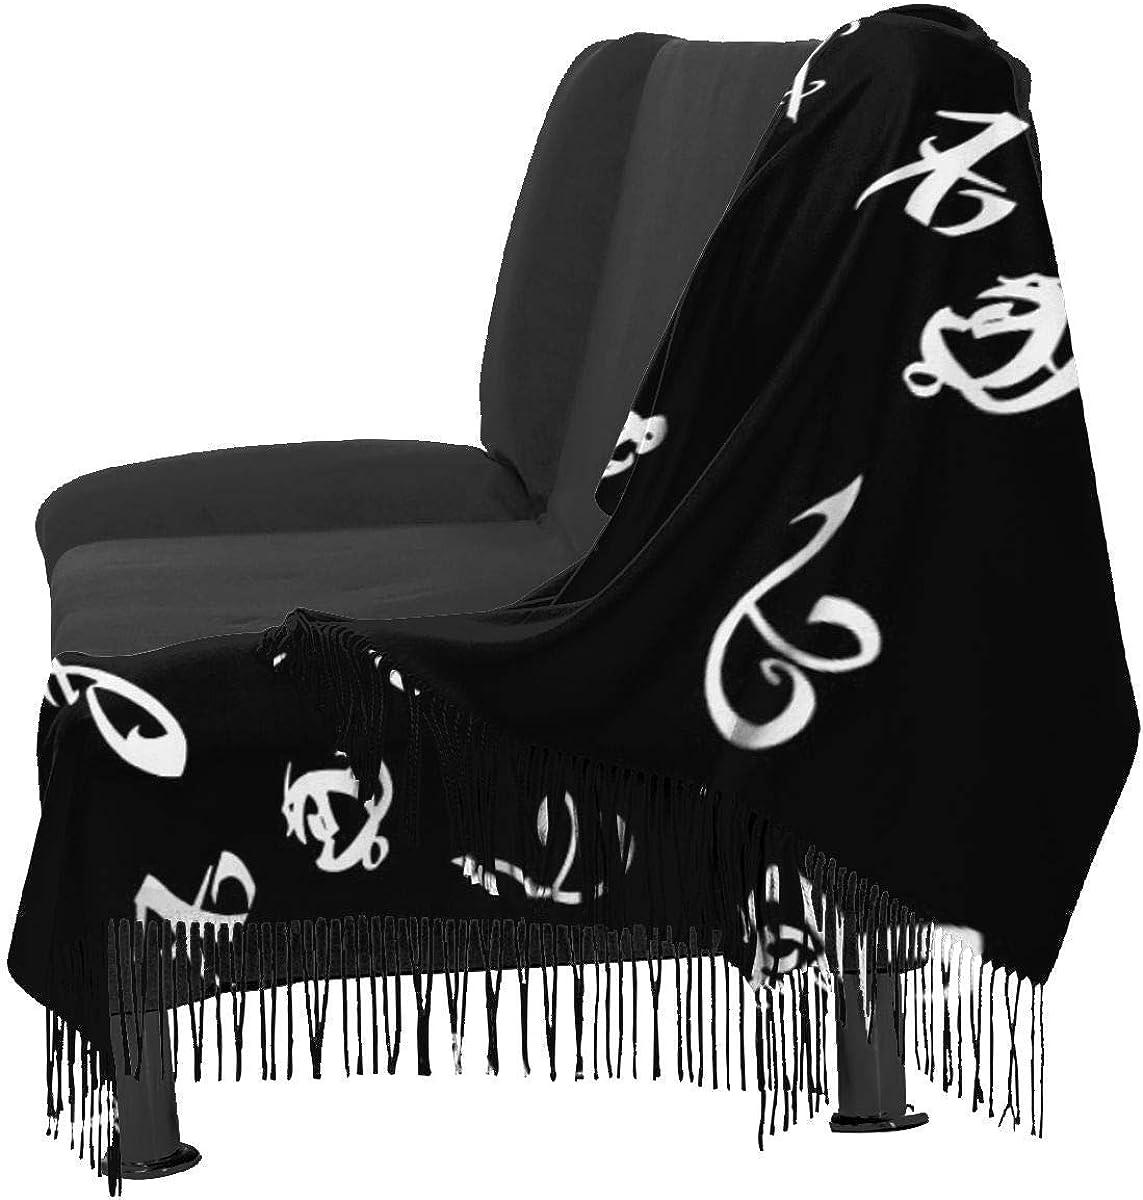 Shadowhunters Runes Women Soft Cashmere Scarf Large Pashminas Shawl Wrap Shawl 77x 27 JJsister Donne Sciarpa Pashmina Avvolgere Scialle Scarf